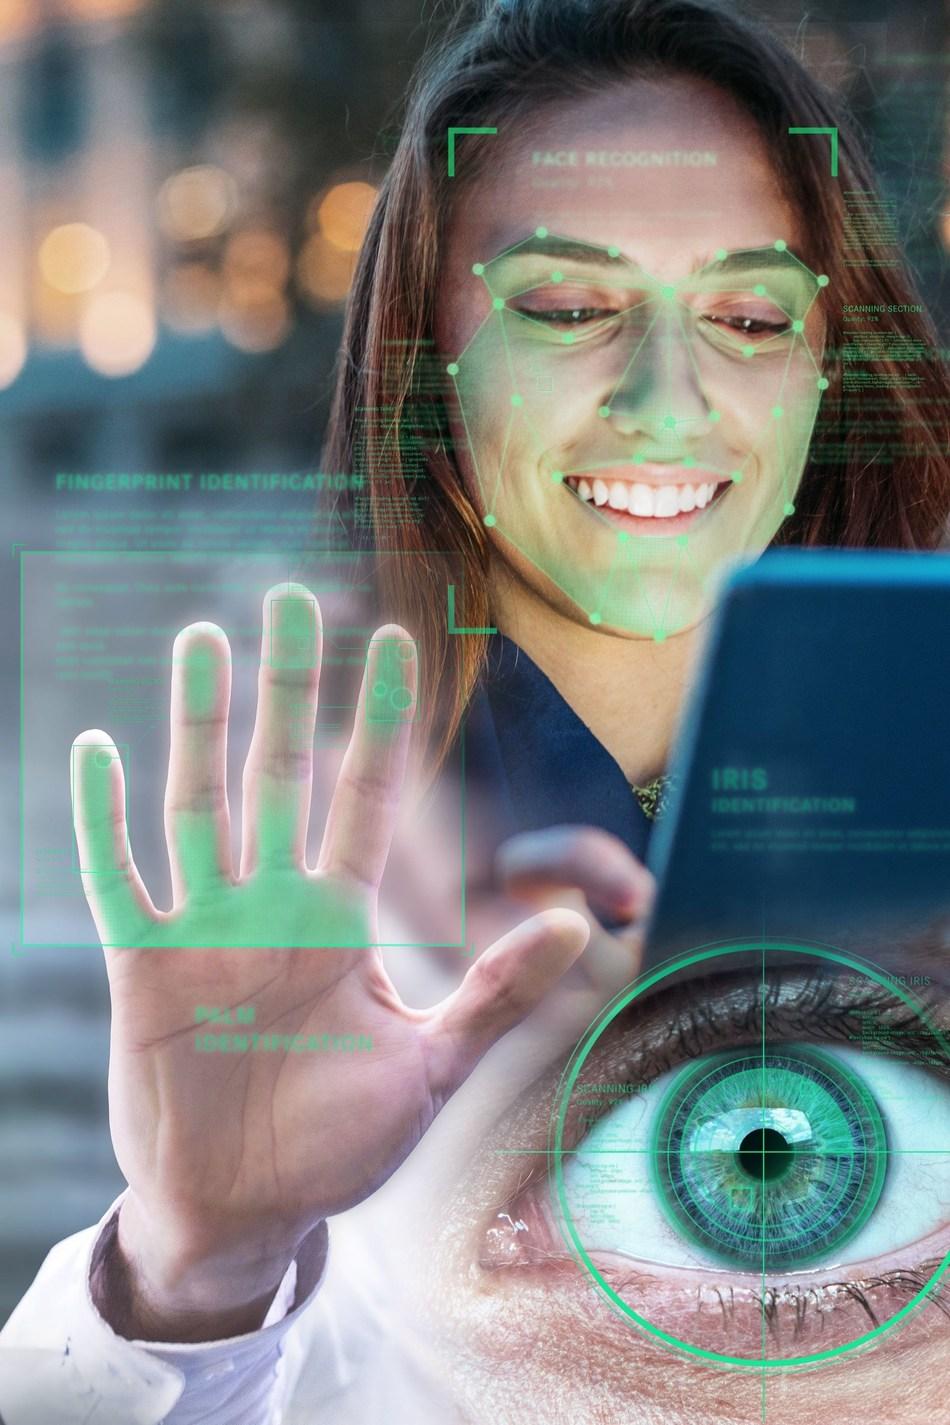 Биометрия и «госуслуги»: банки начали собирать лица и голоса клиентов